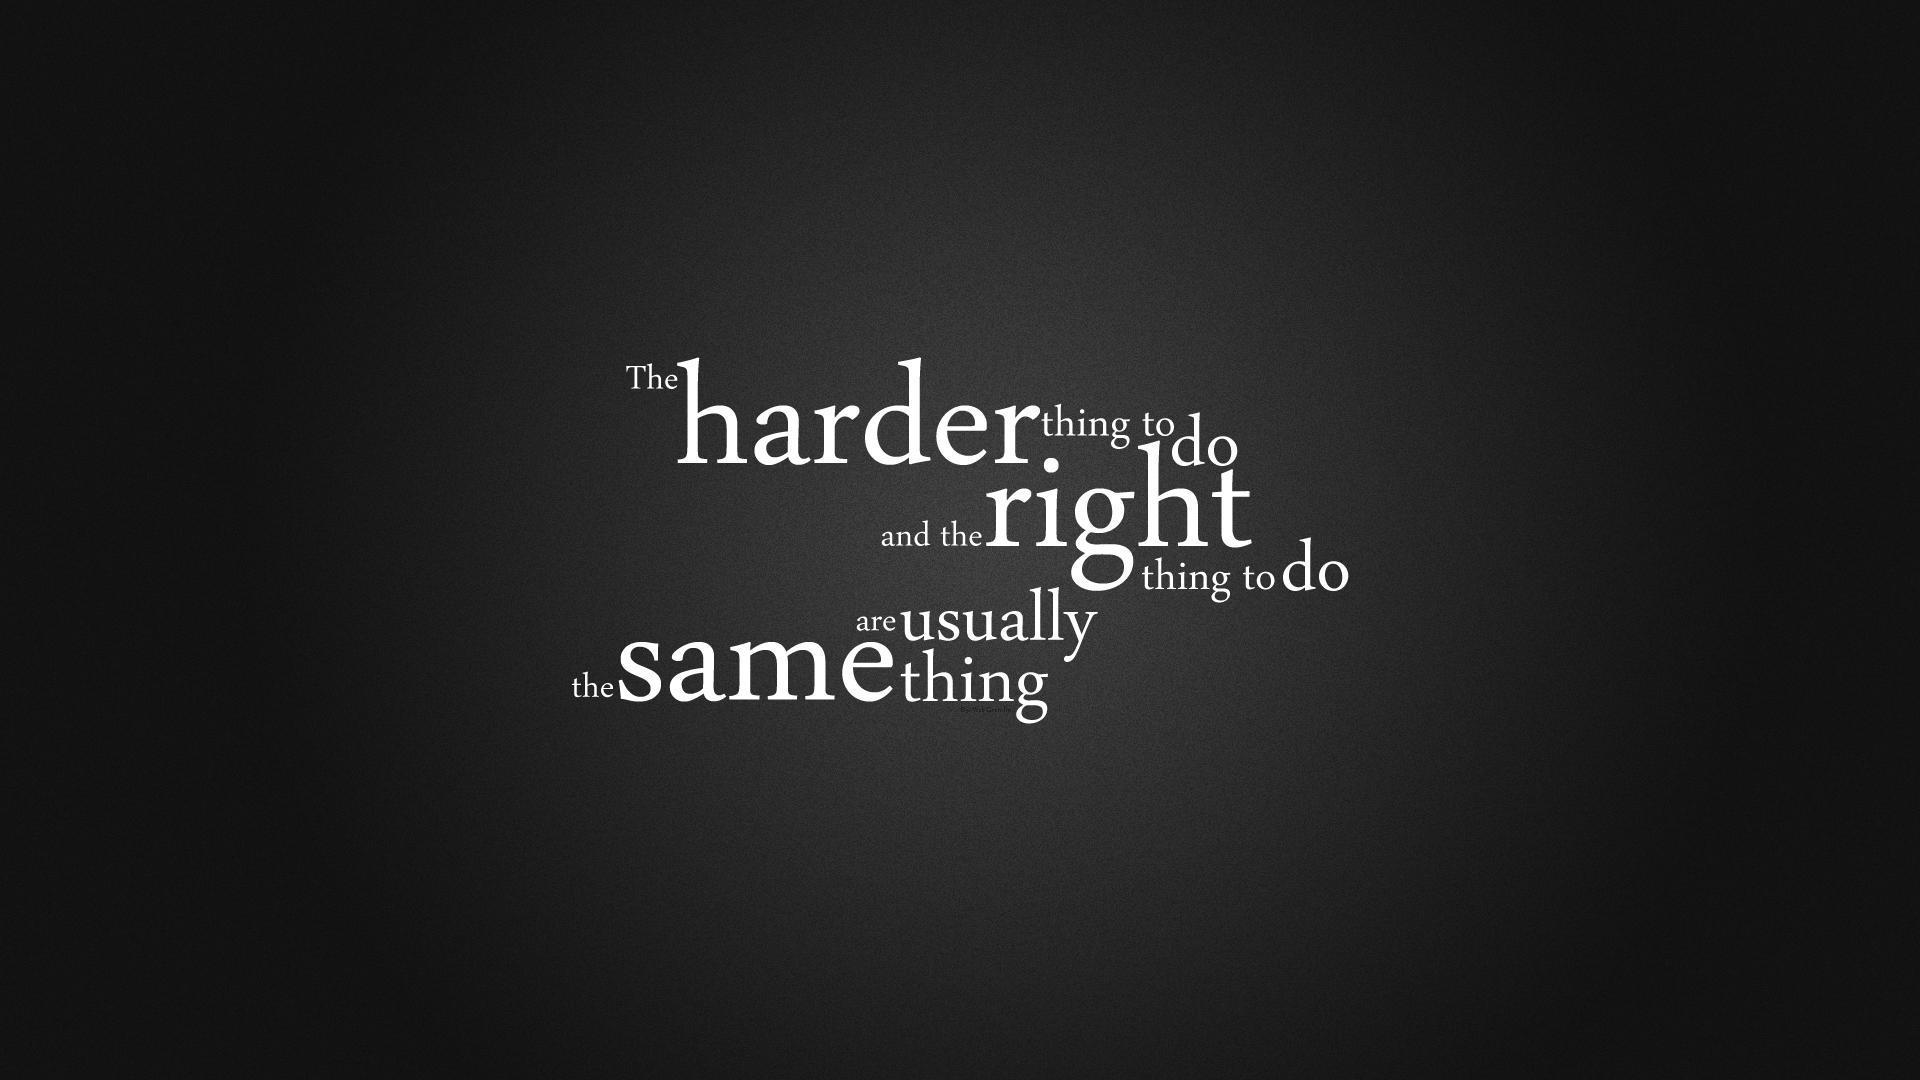 Inspirational Motivational Quotes Desktop Wallpaper